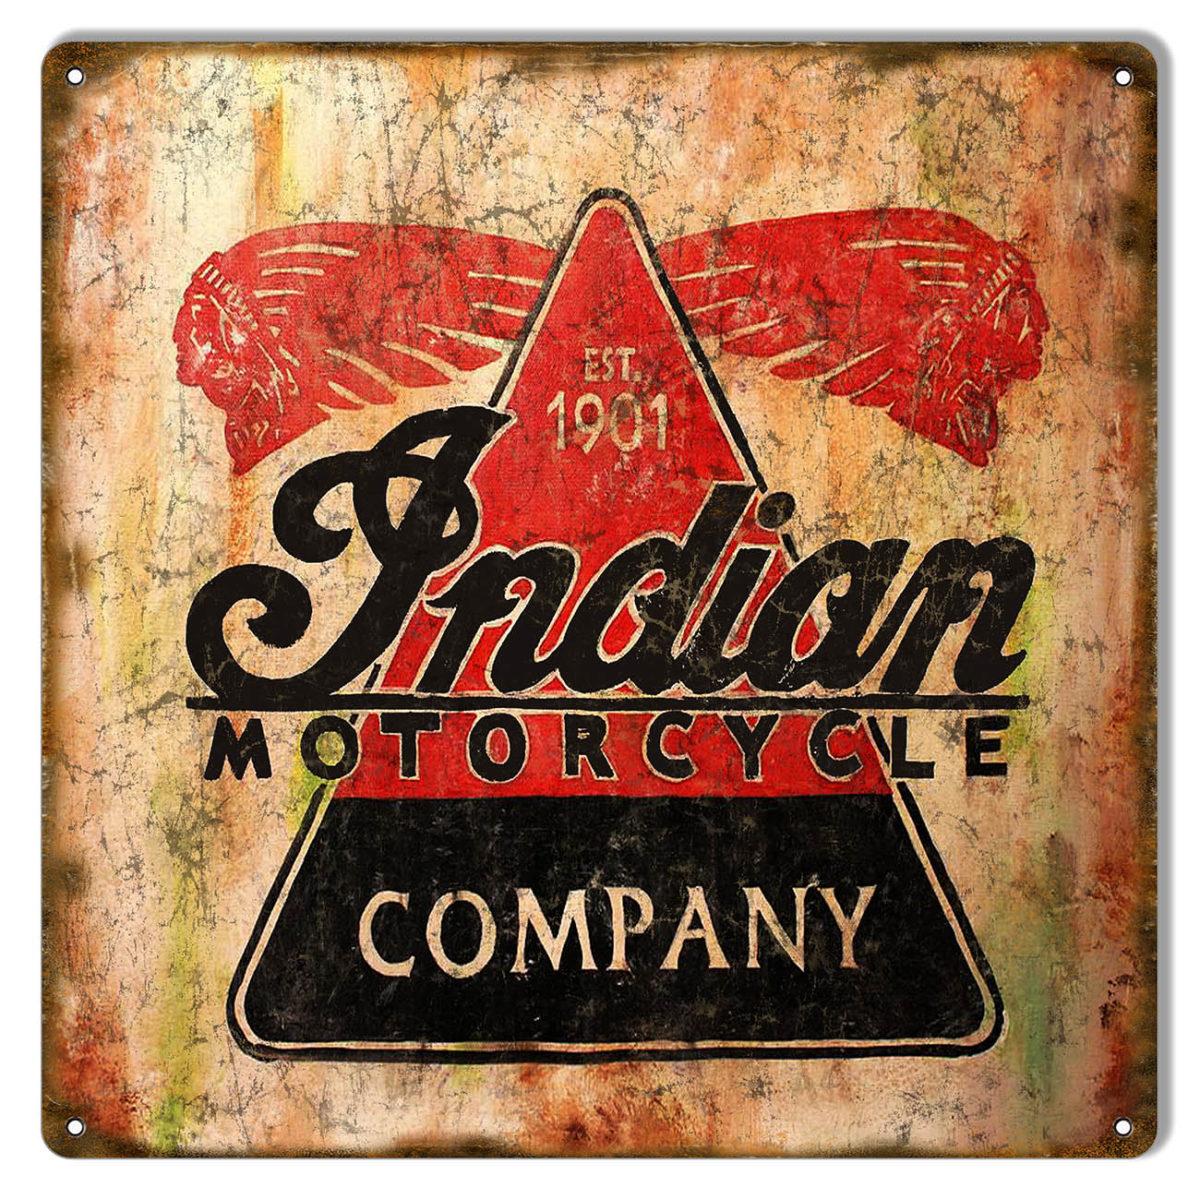 Indian Motorcycle Company Est 1901 Vintage Metal Sign 12